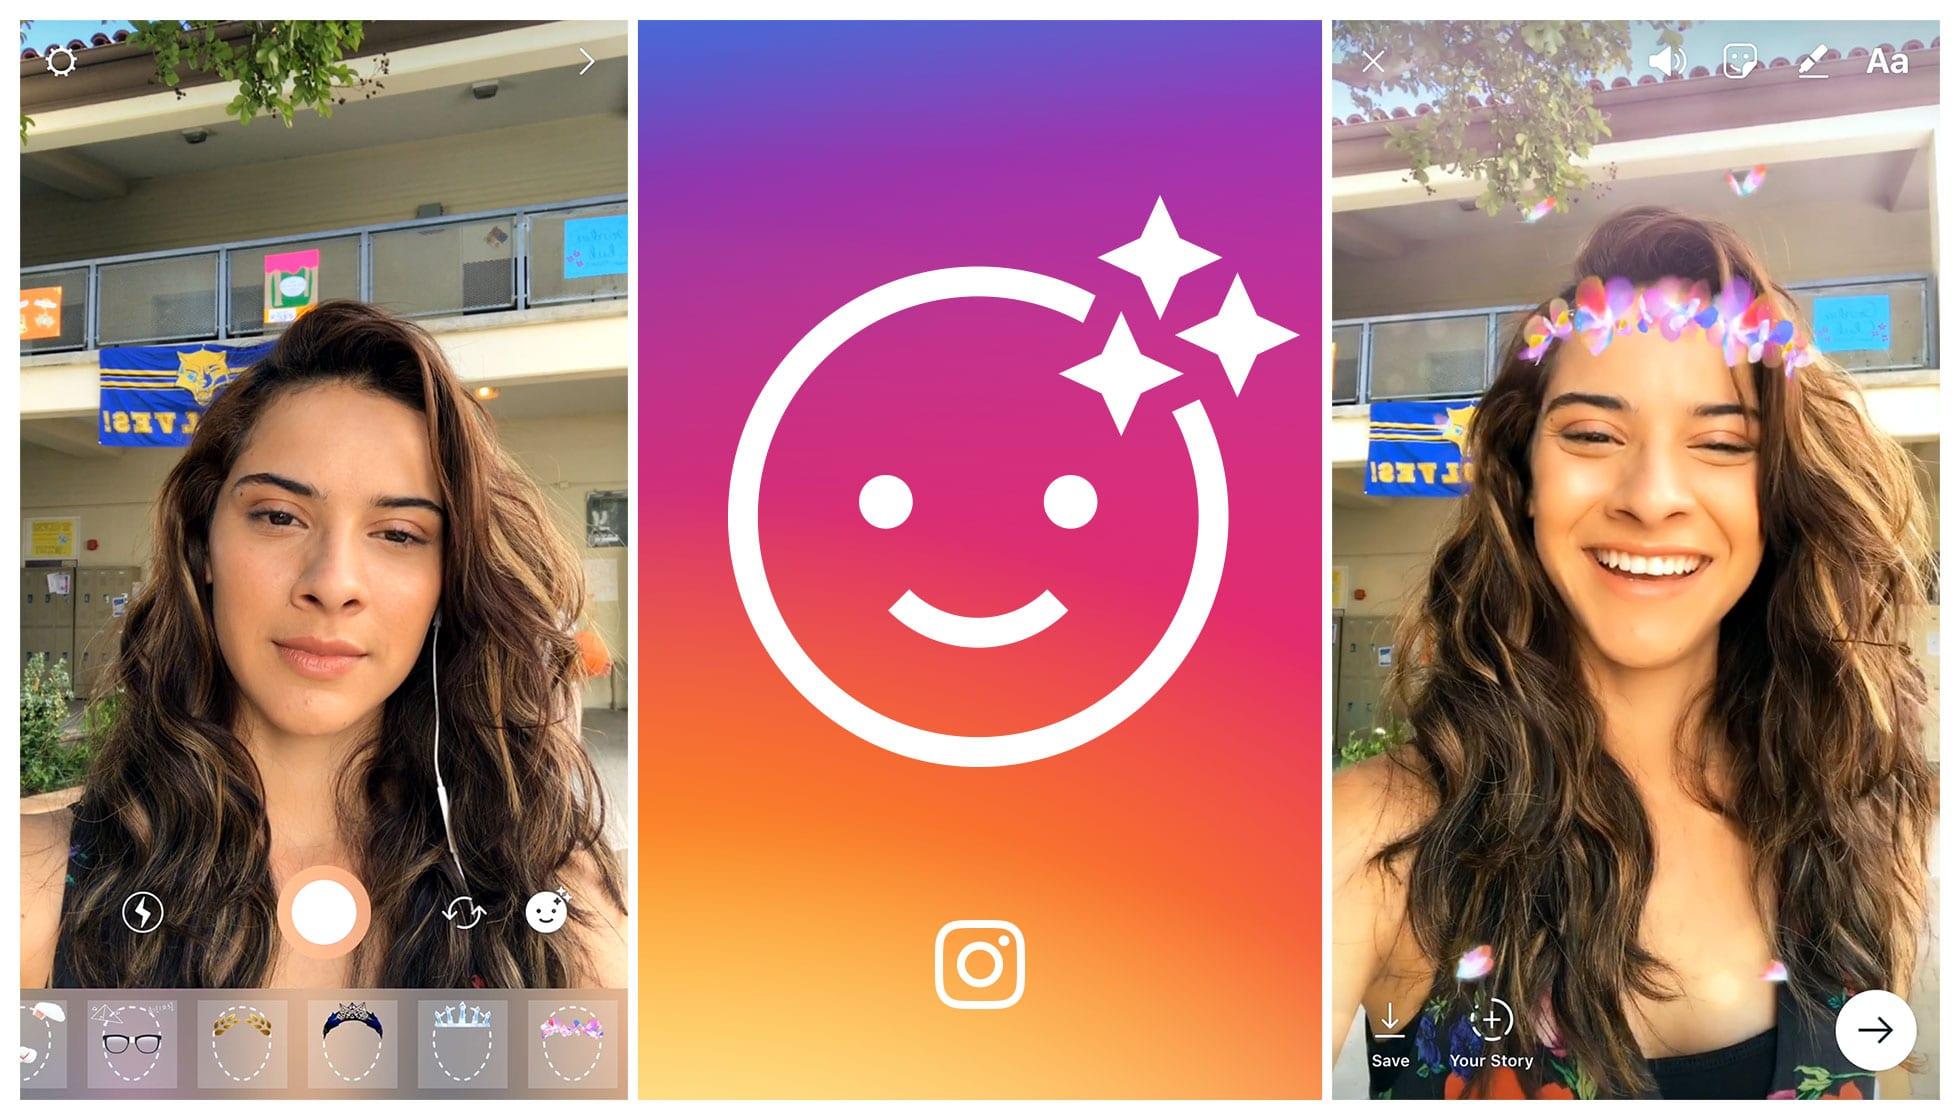 ar filters_instagram